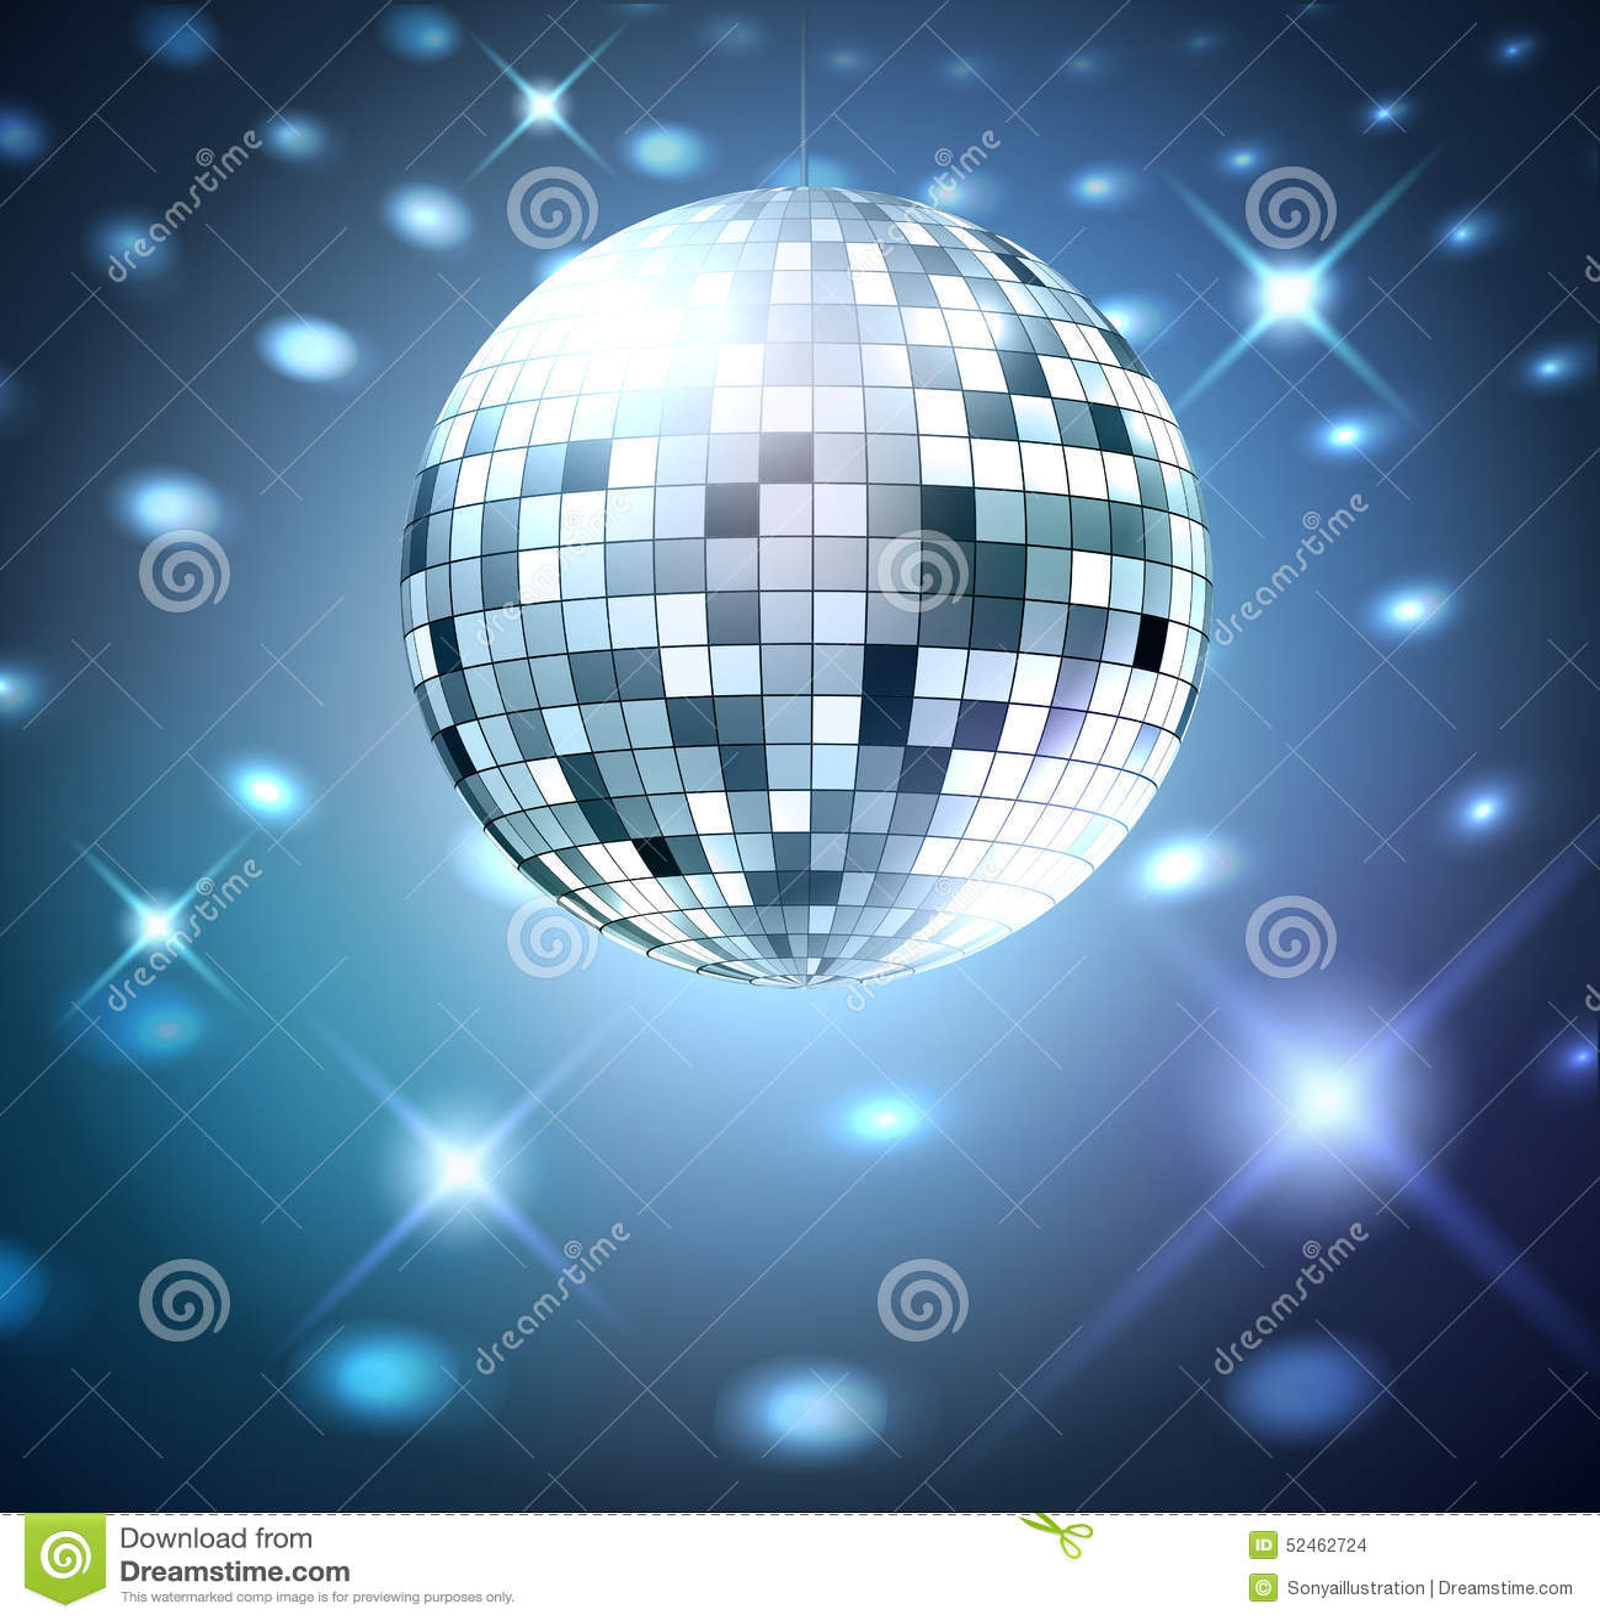 silver disco ball background - photo #21